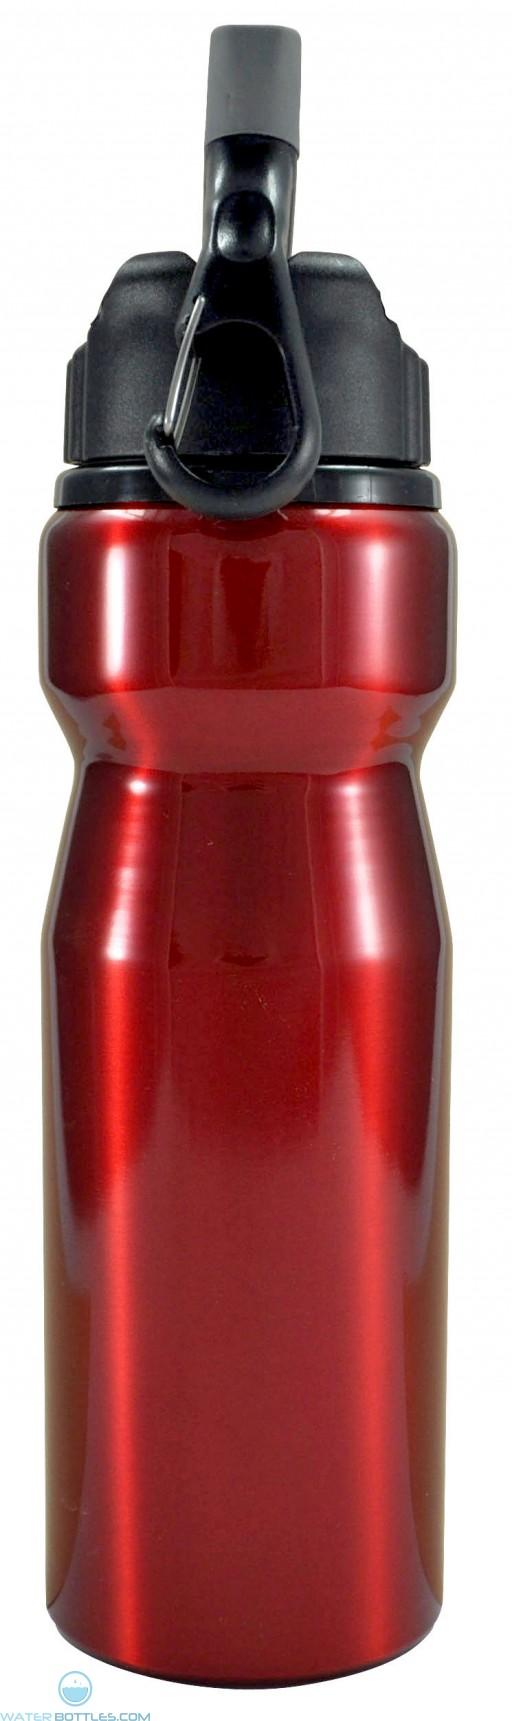 Performance Bottles   27 oz - Red